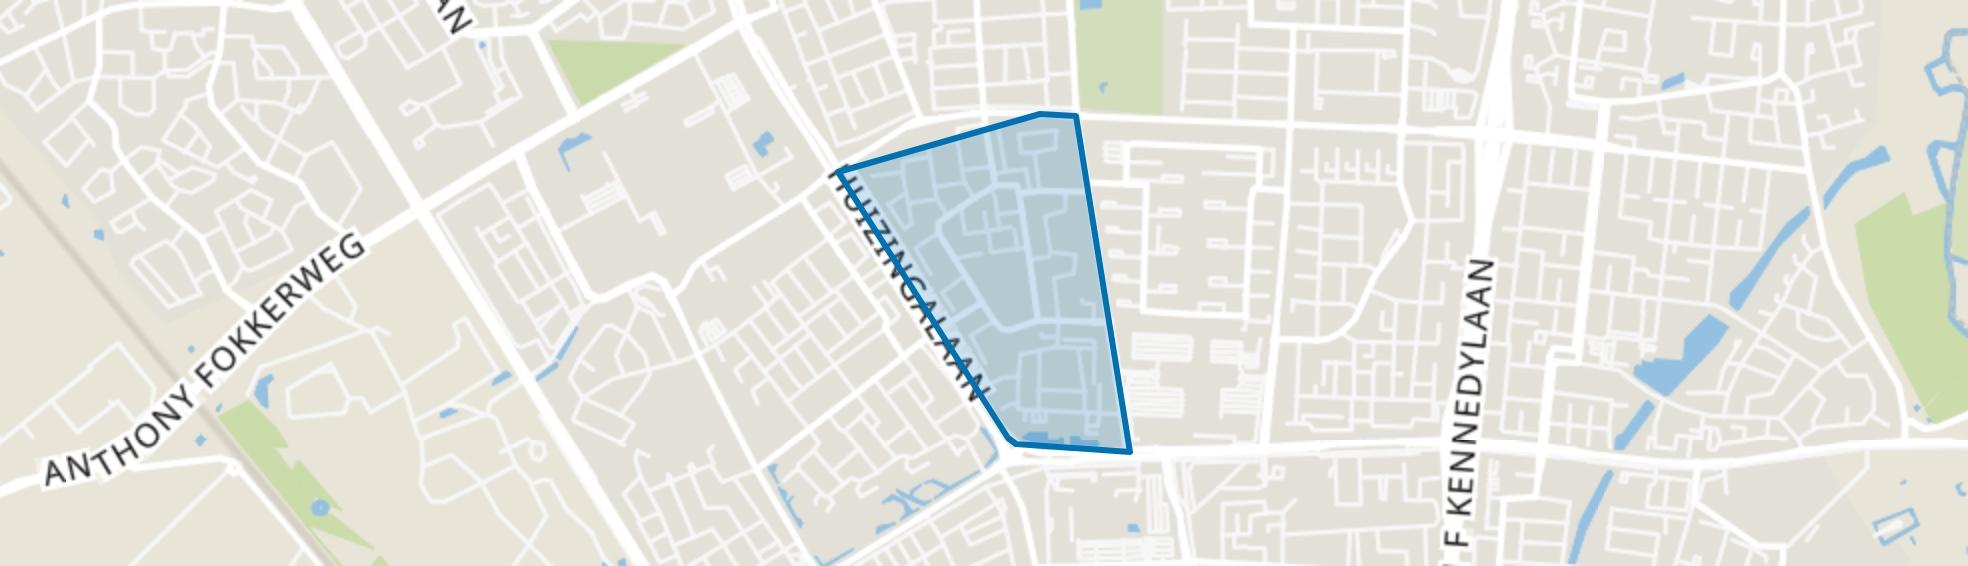 Jagershoef, Eindhoven map